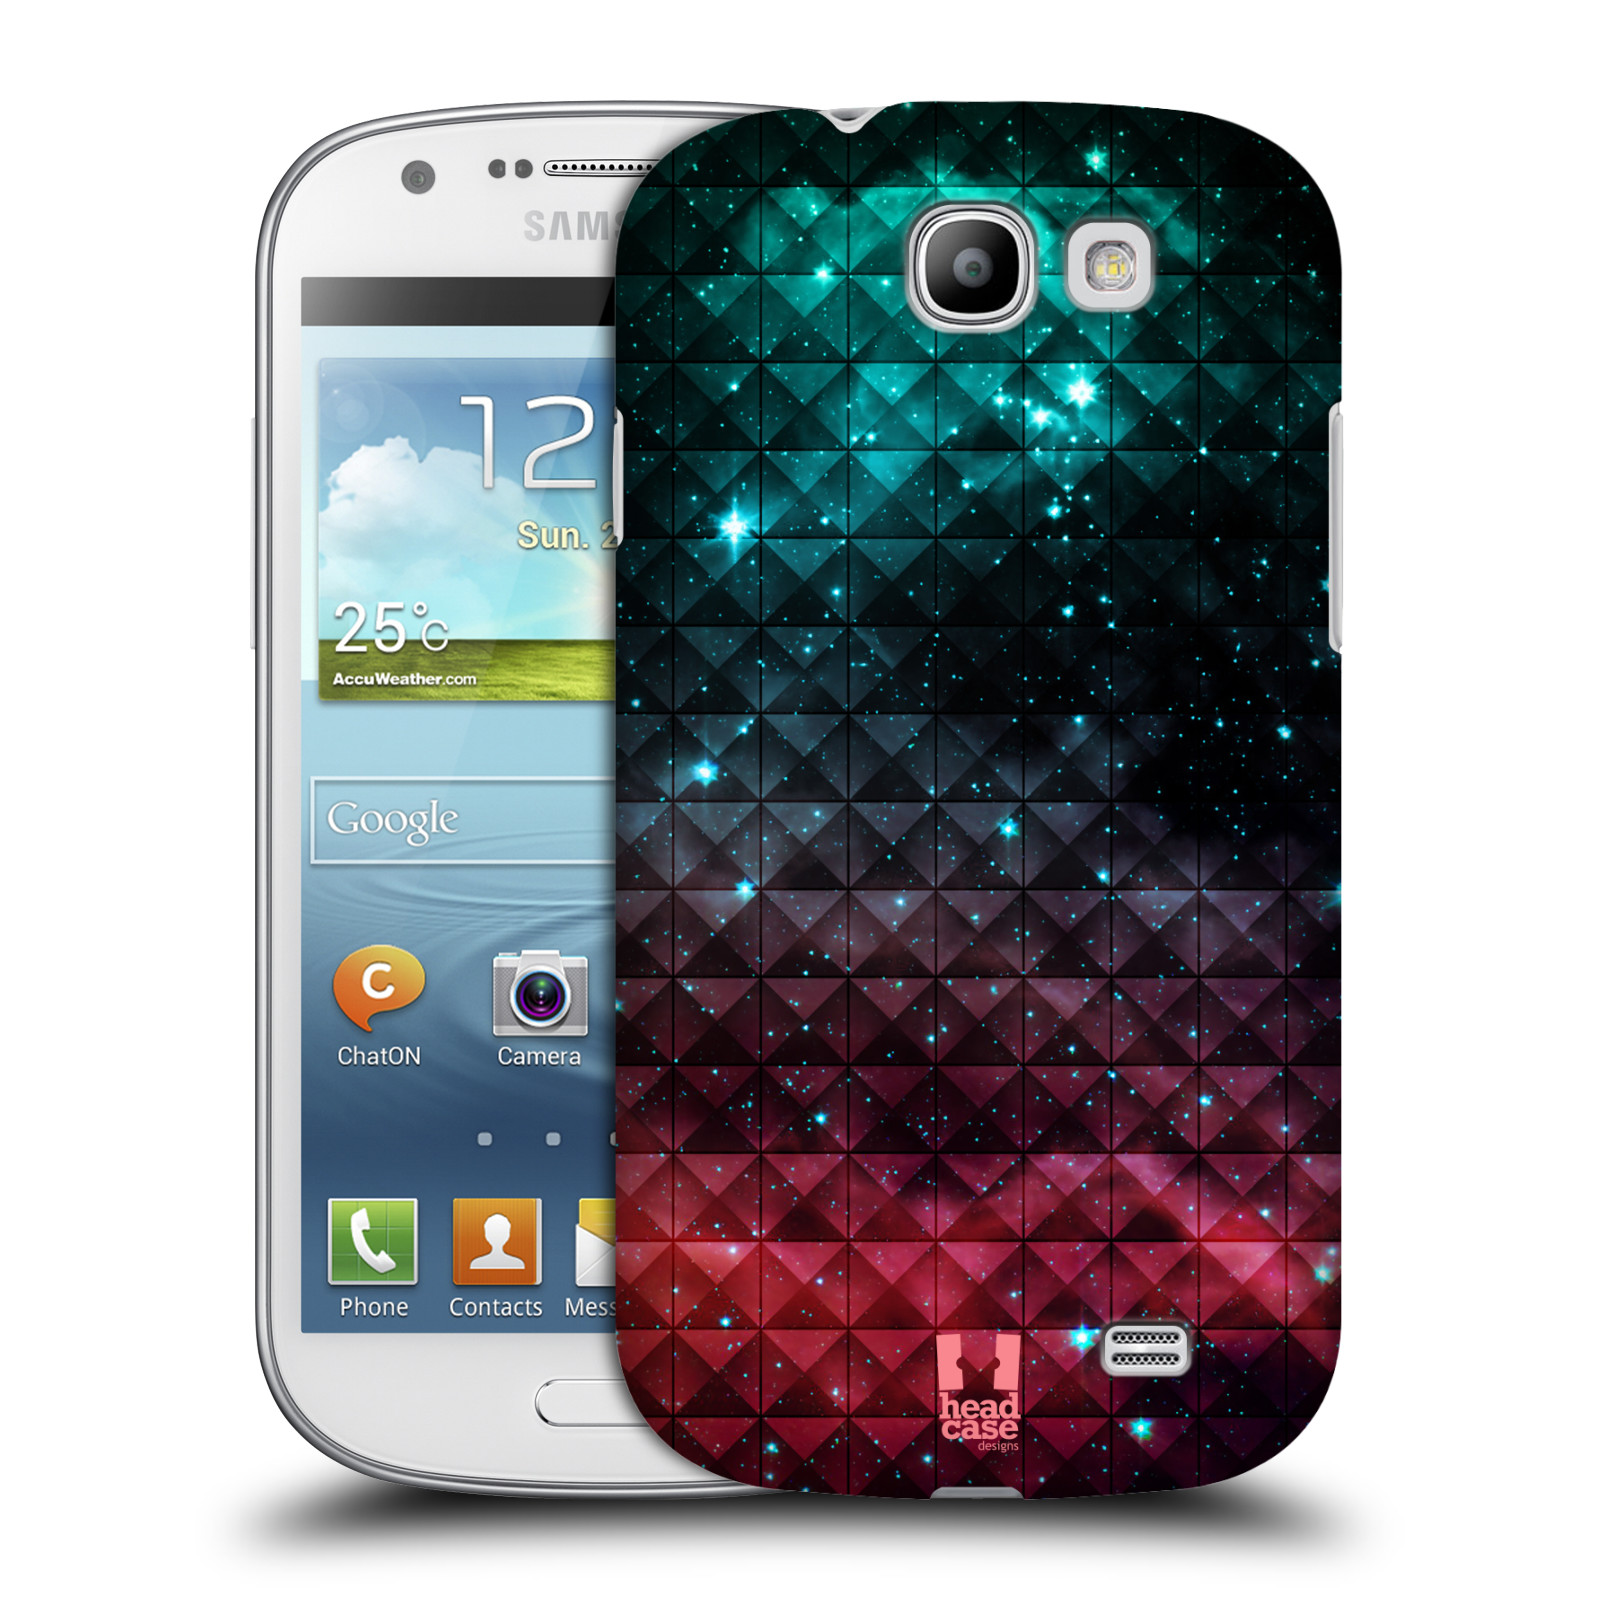 Plastové pouzdro na mobil Samsung Galaxy Express HEAD CASE OMBRE SPARKLE (Kryt či obal na mobilní telefon Samsung Galaxy Express GT-i8730)